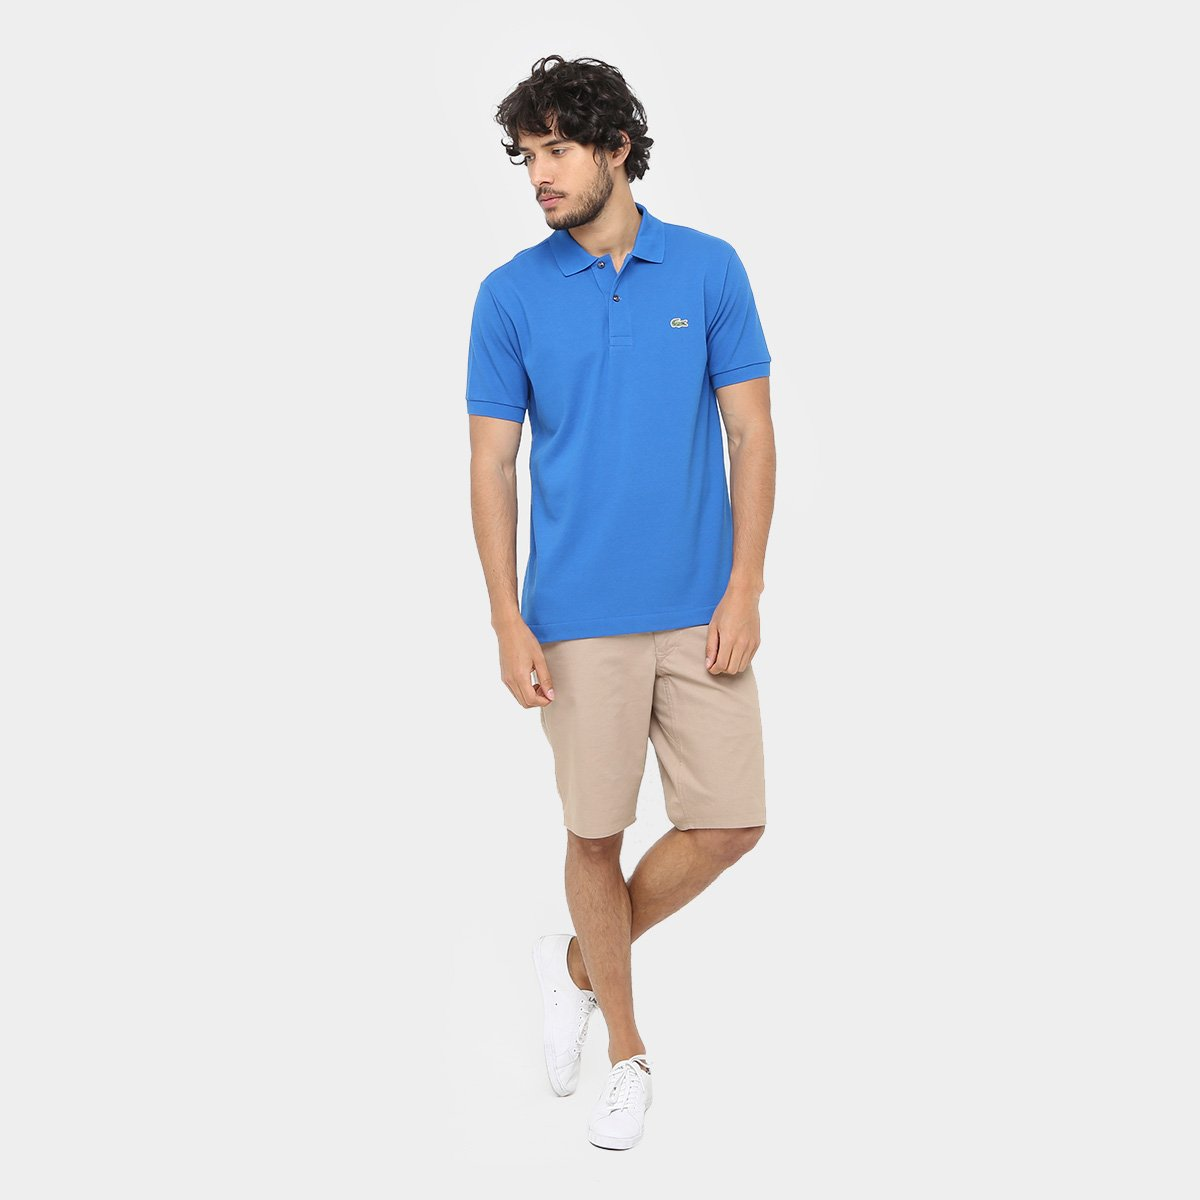 Camisa Polo Lacoste Piquet Original Fit Masculina - Azul Royal ... ac1bbc2dd5